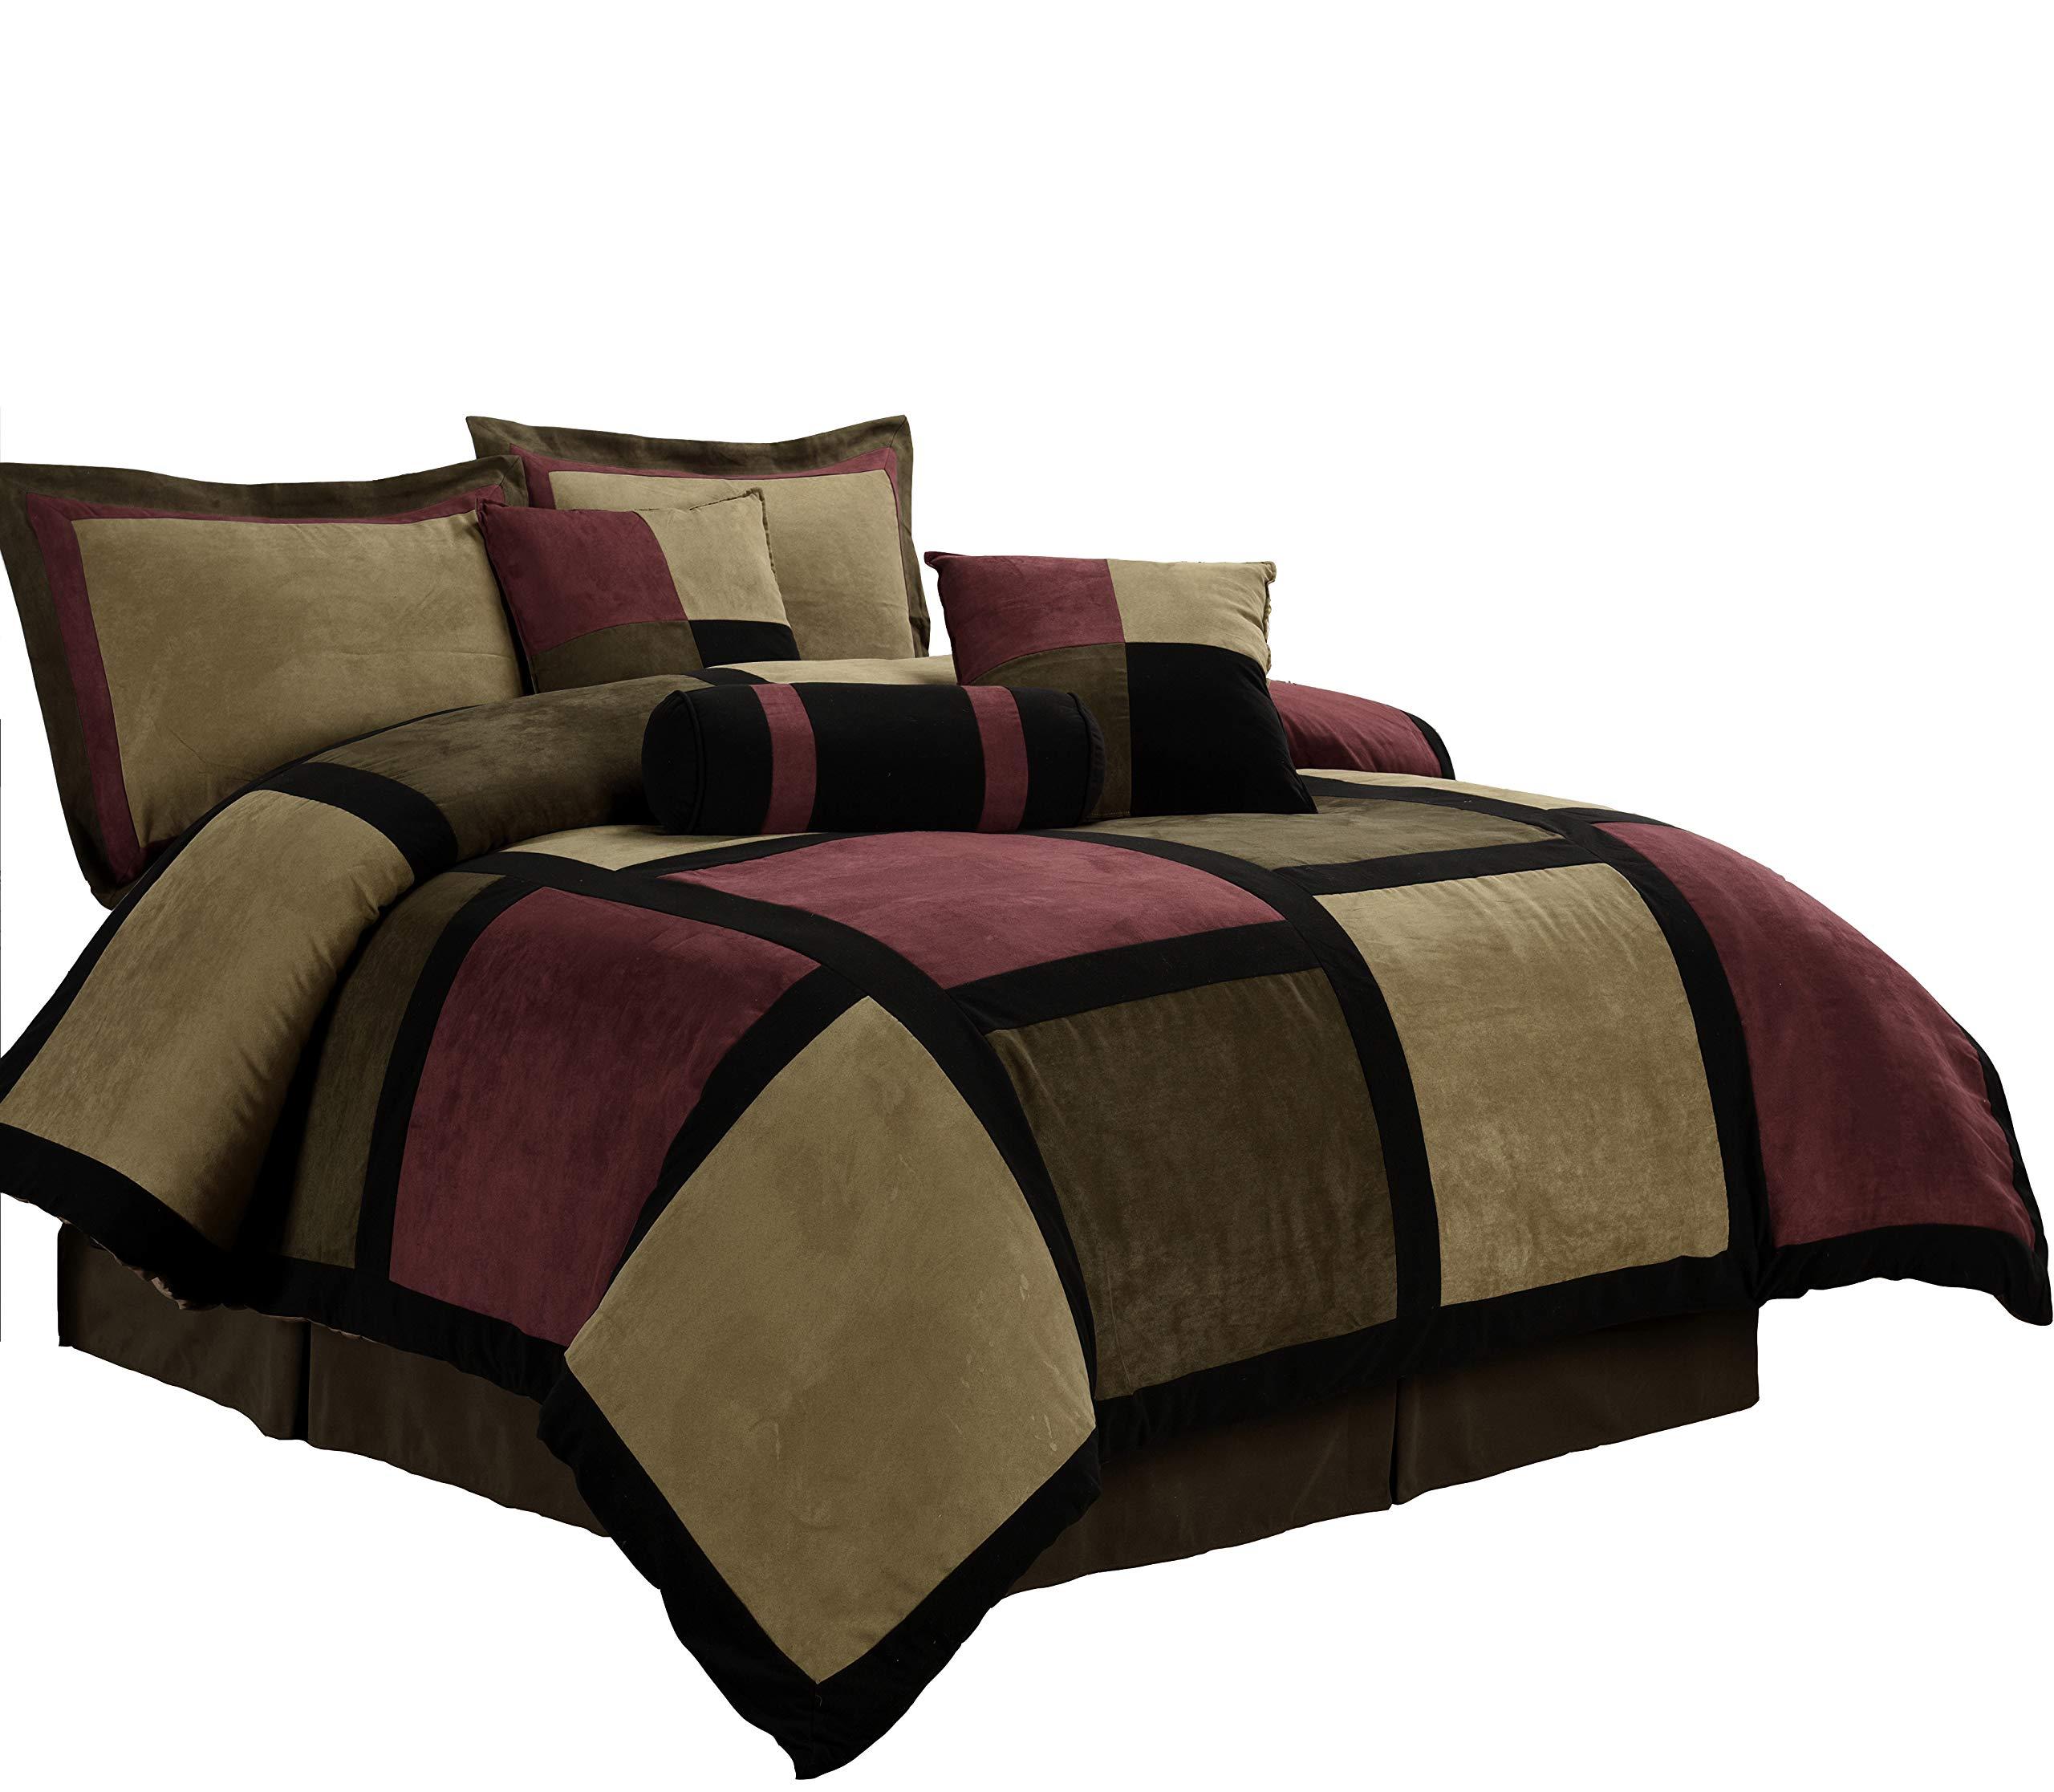 Chezmoi Collection Micro Suede Patchwork 7-Piece Comforter Set, Queen, Brown/Burgundy/Black